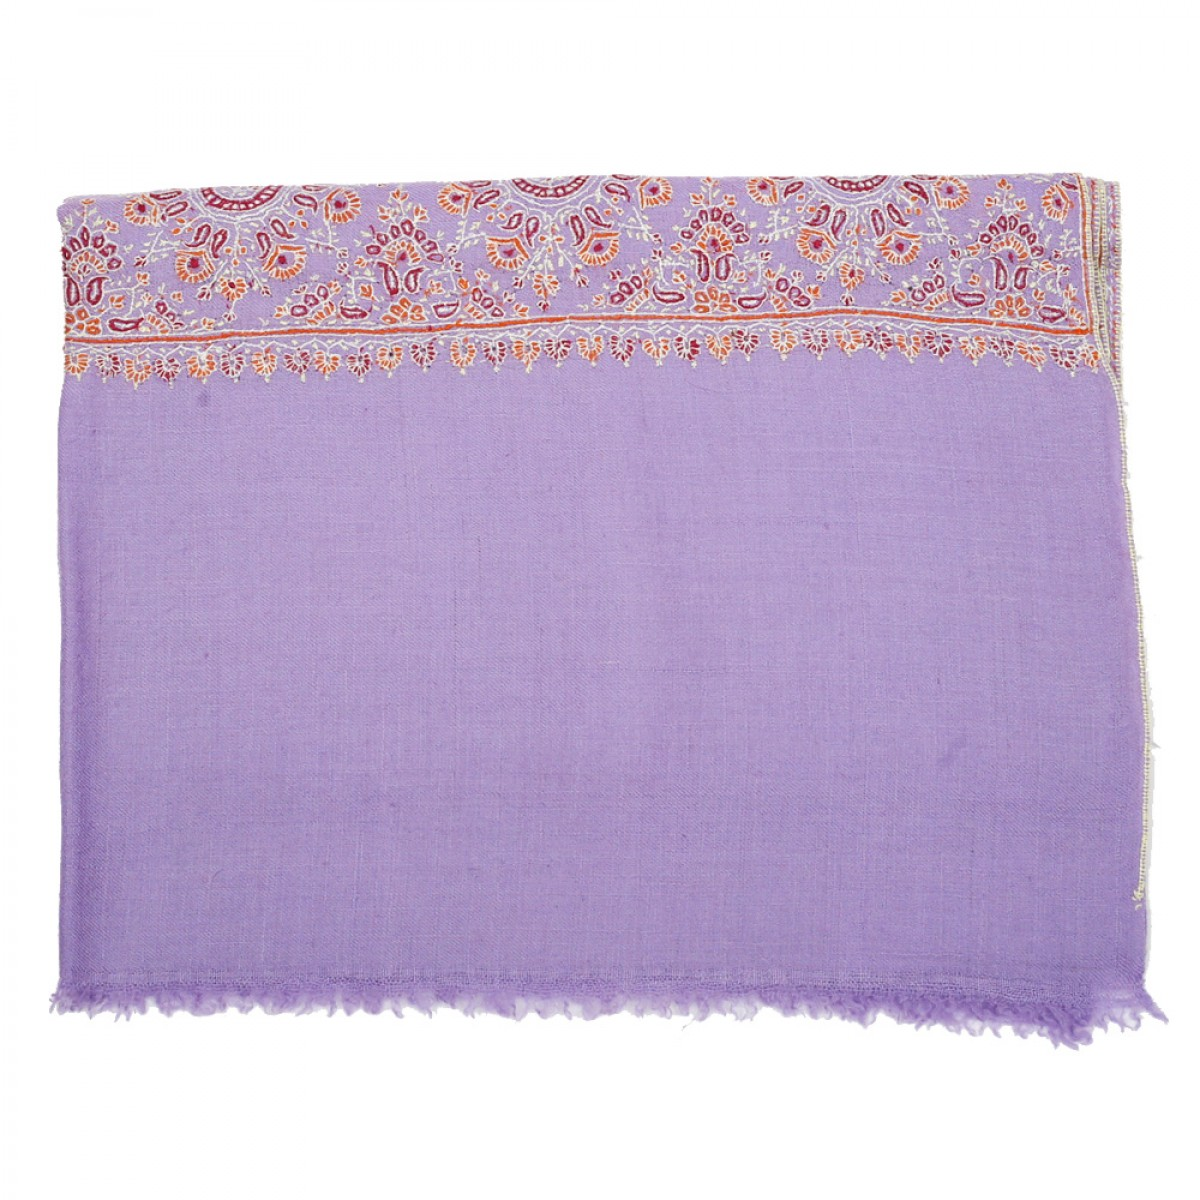 Embroidered Pashmina Stole - Purple